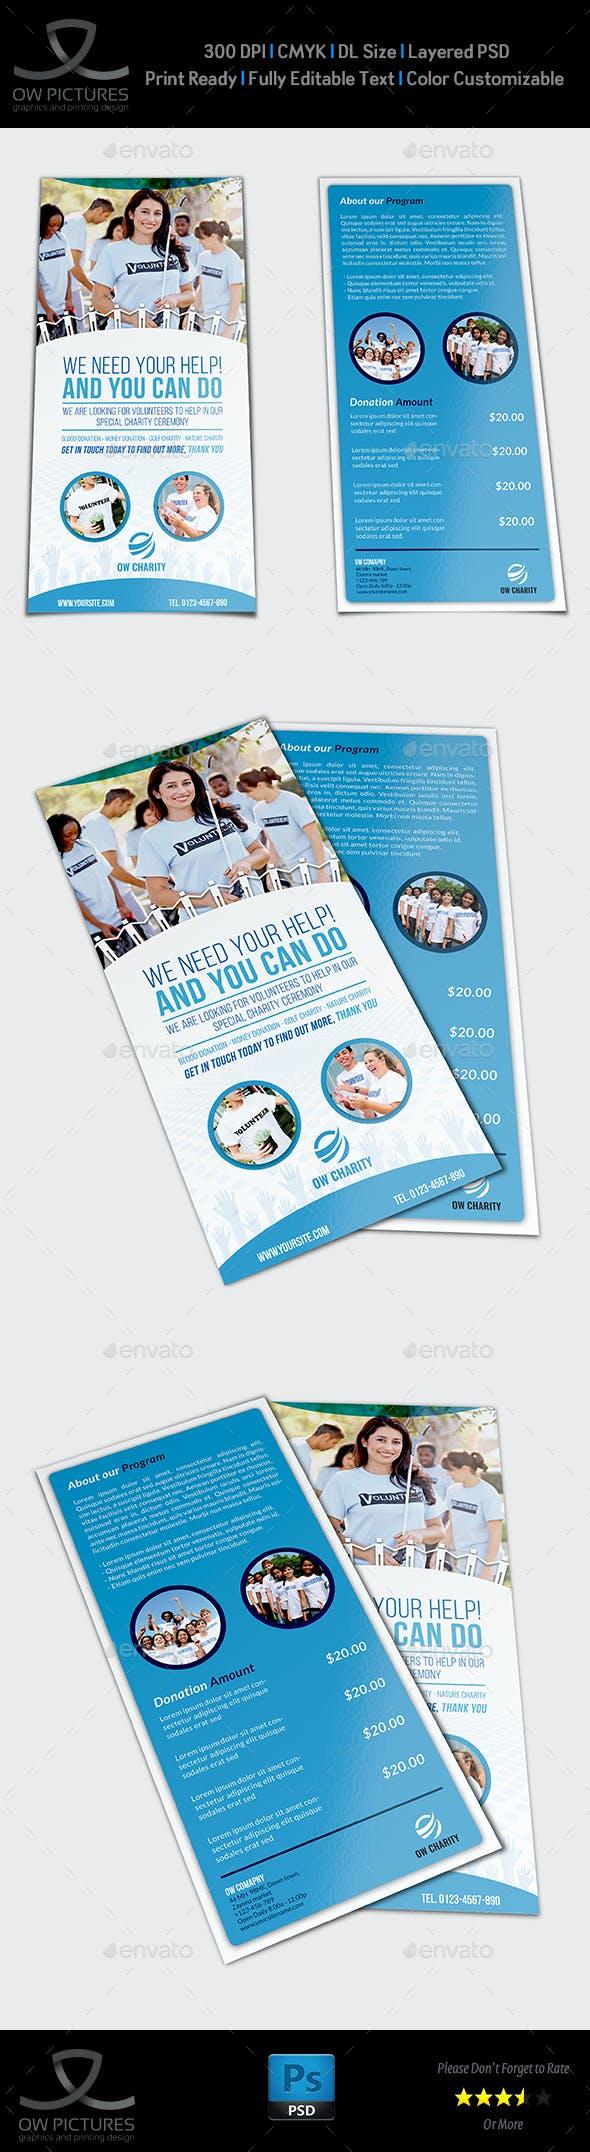 volunteer flyer template vol2 dl size flyers print templates